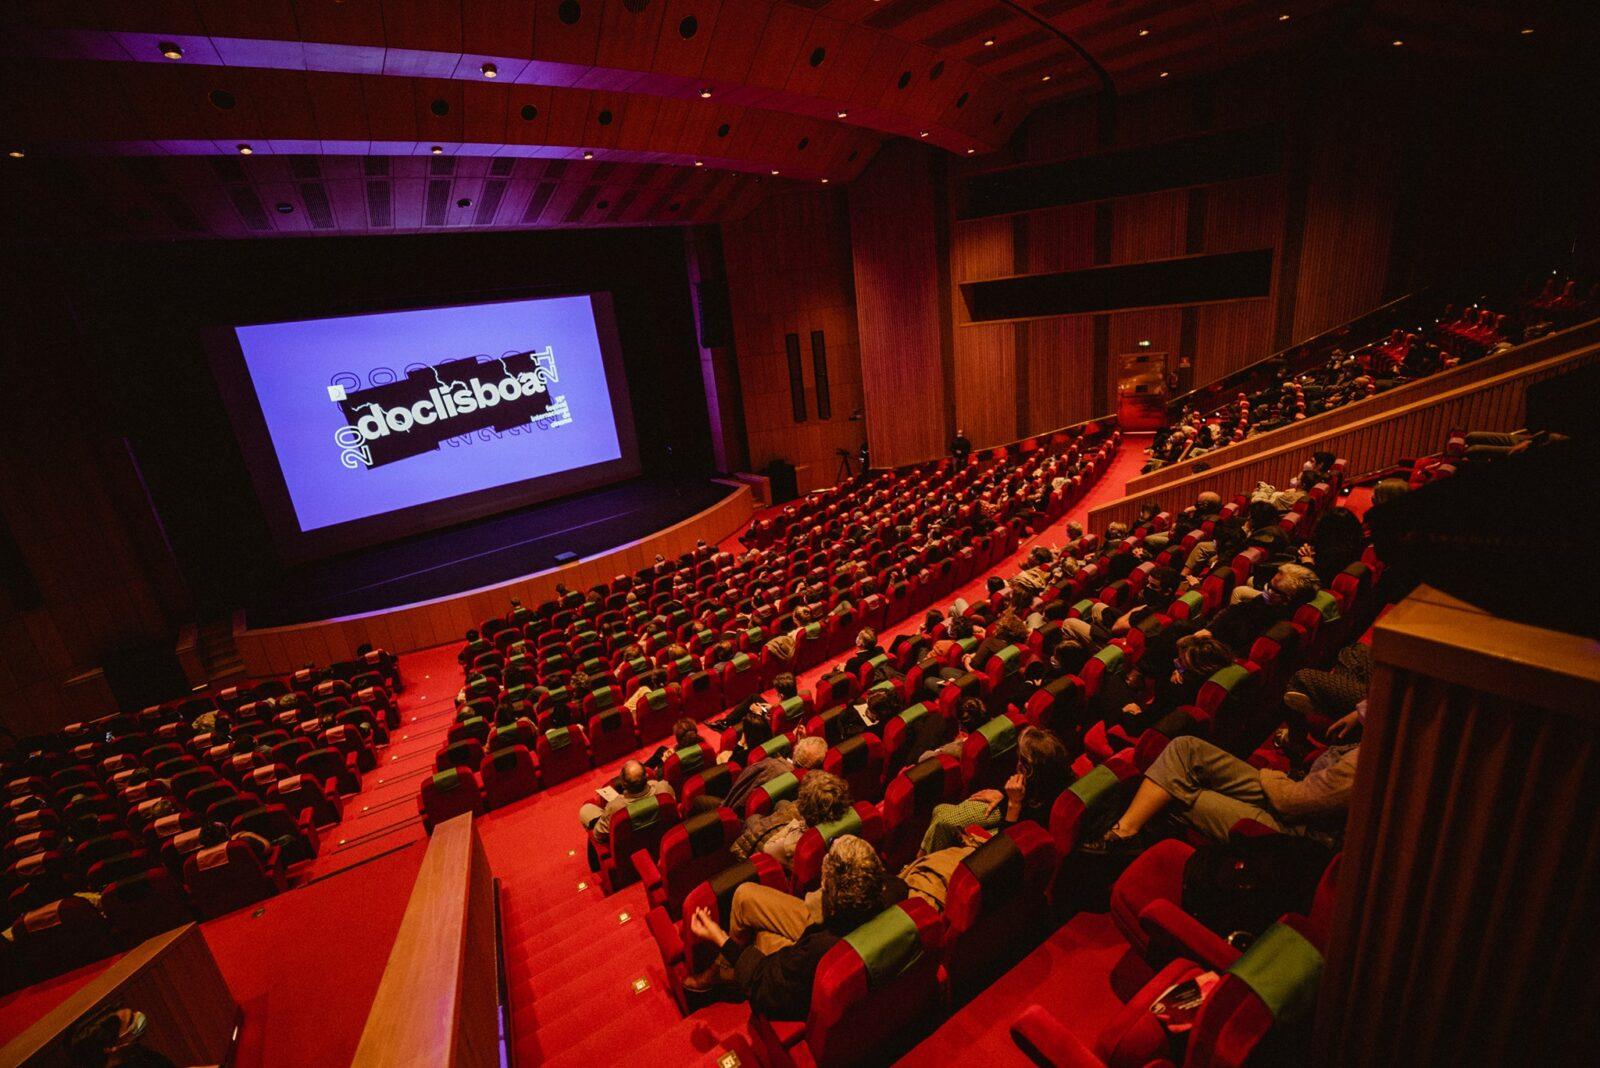 Doclisboa screening